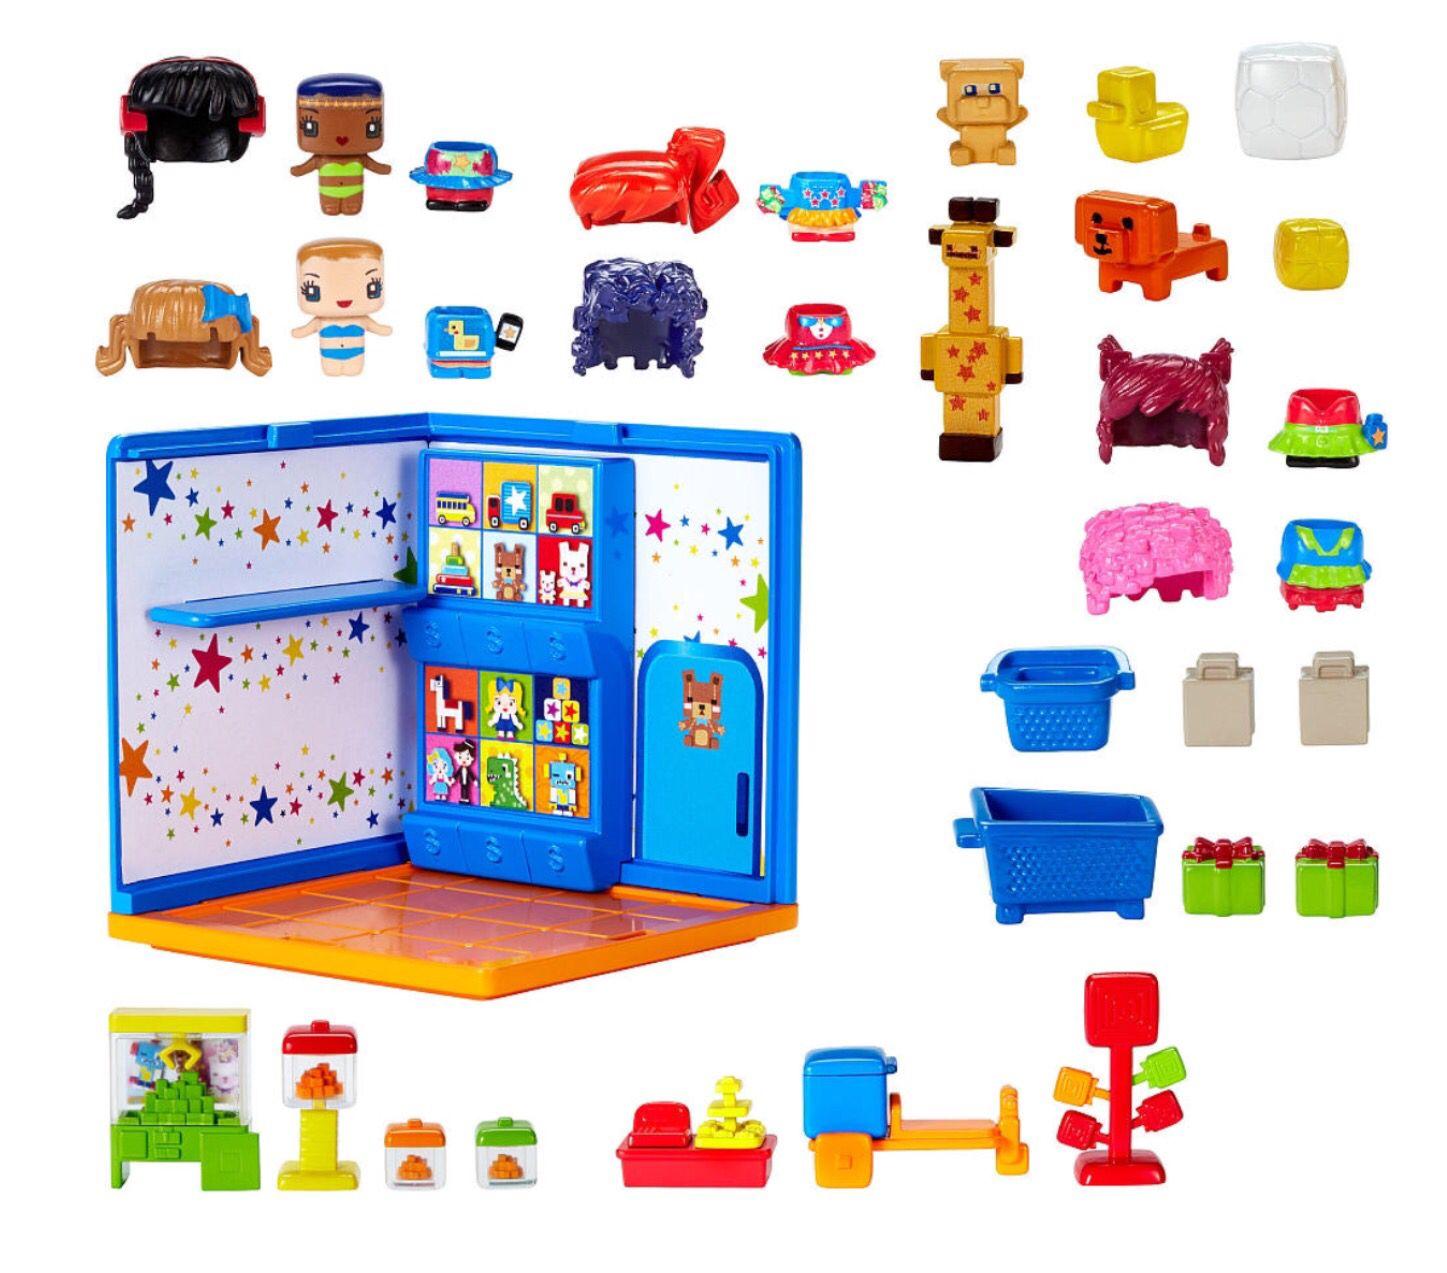 Mini Mixie My Q'sToy Toys R UsEmma Storefrom CsdQtrh